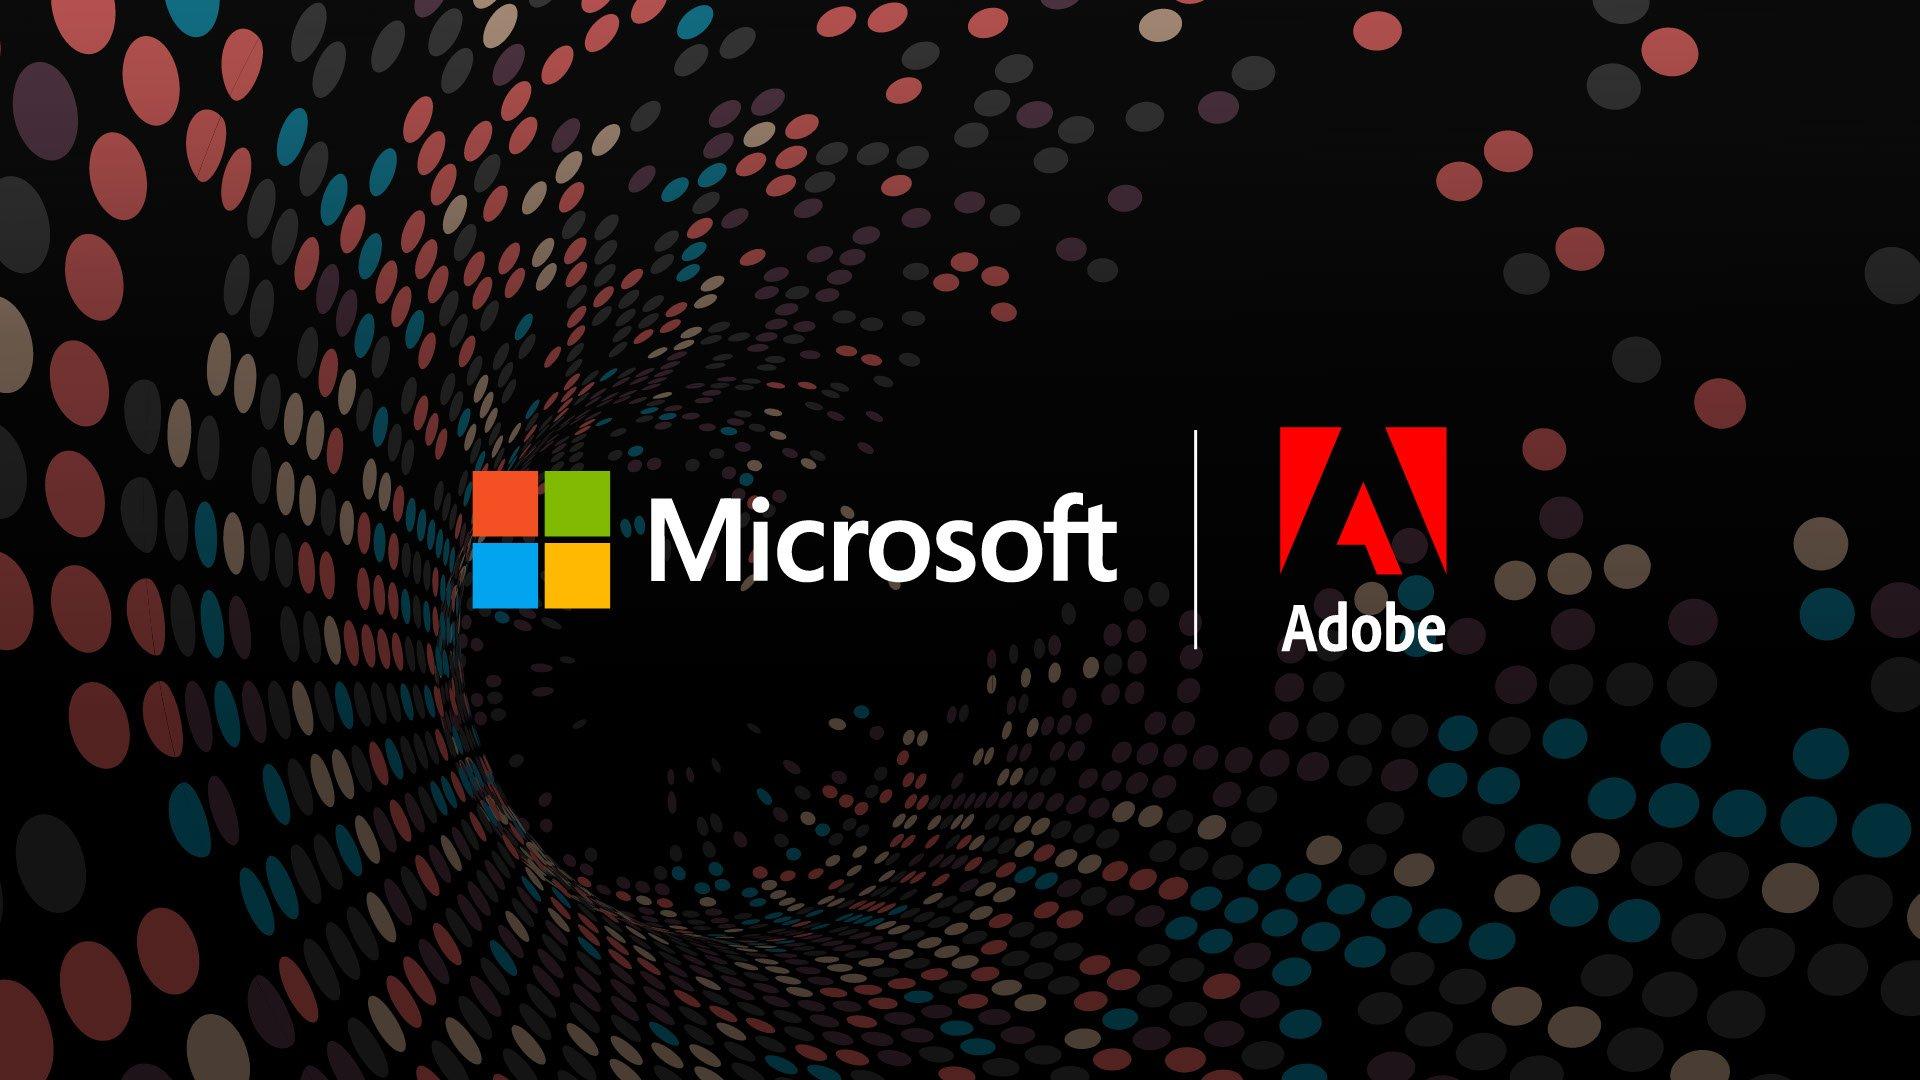 Microsoft and Adobe strengthen partnership to take on Salesforce using LinkedIn 1